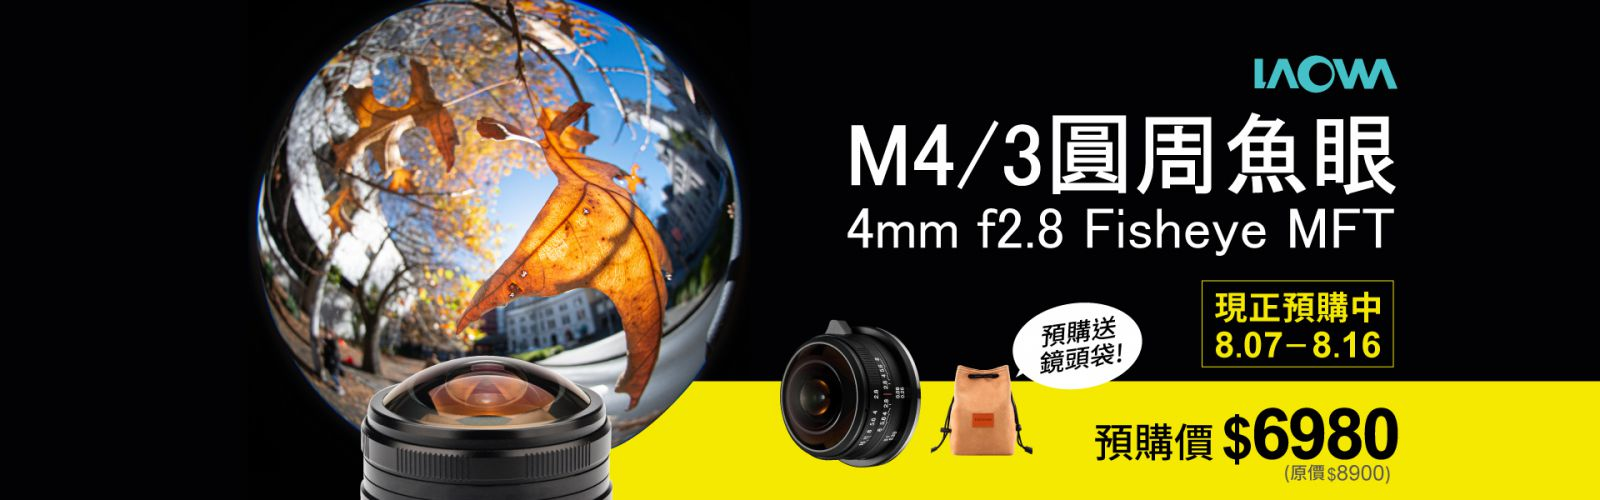 Laowa 4mm M4/3魚眼鏡頭-現正預購